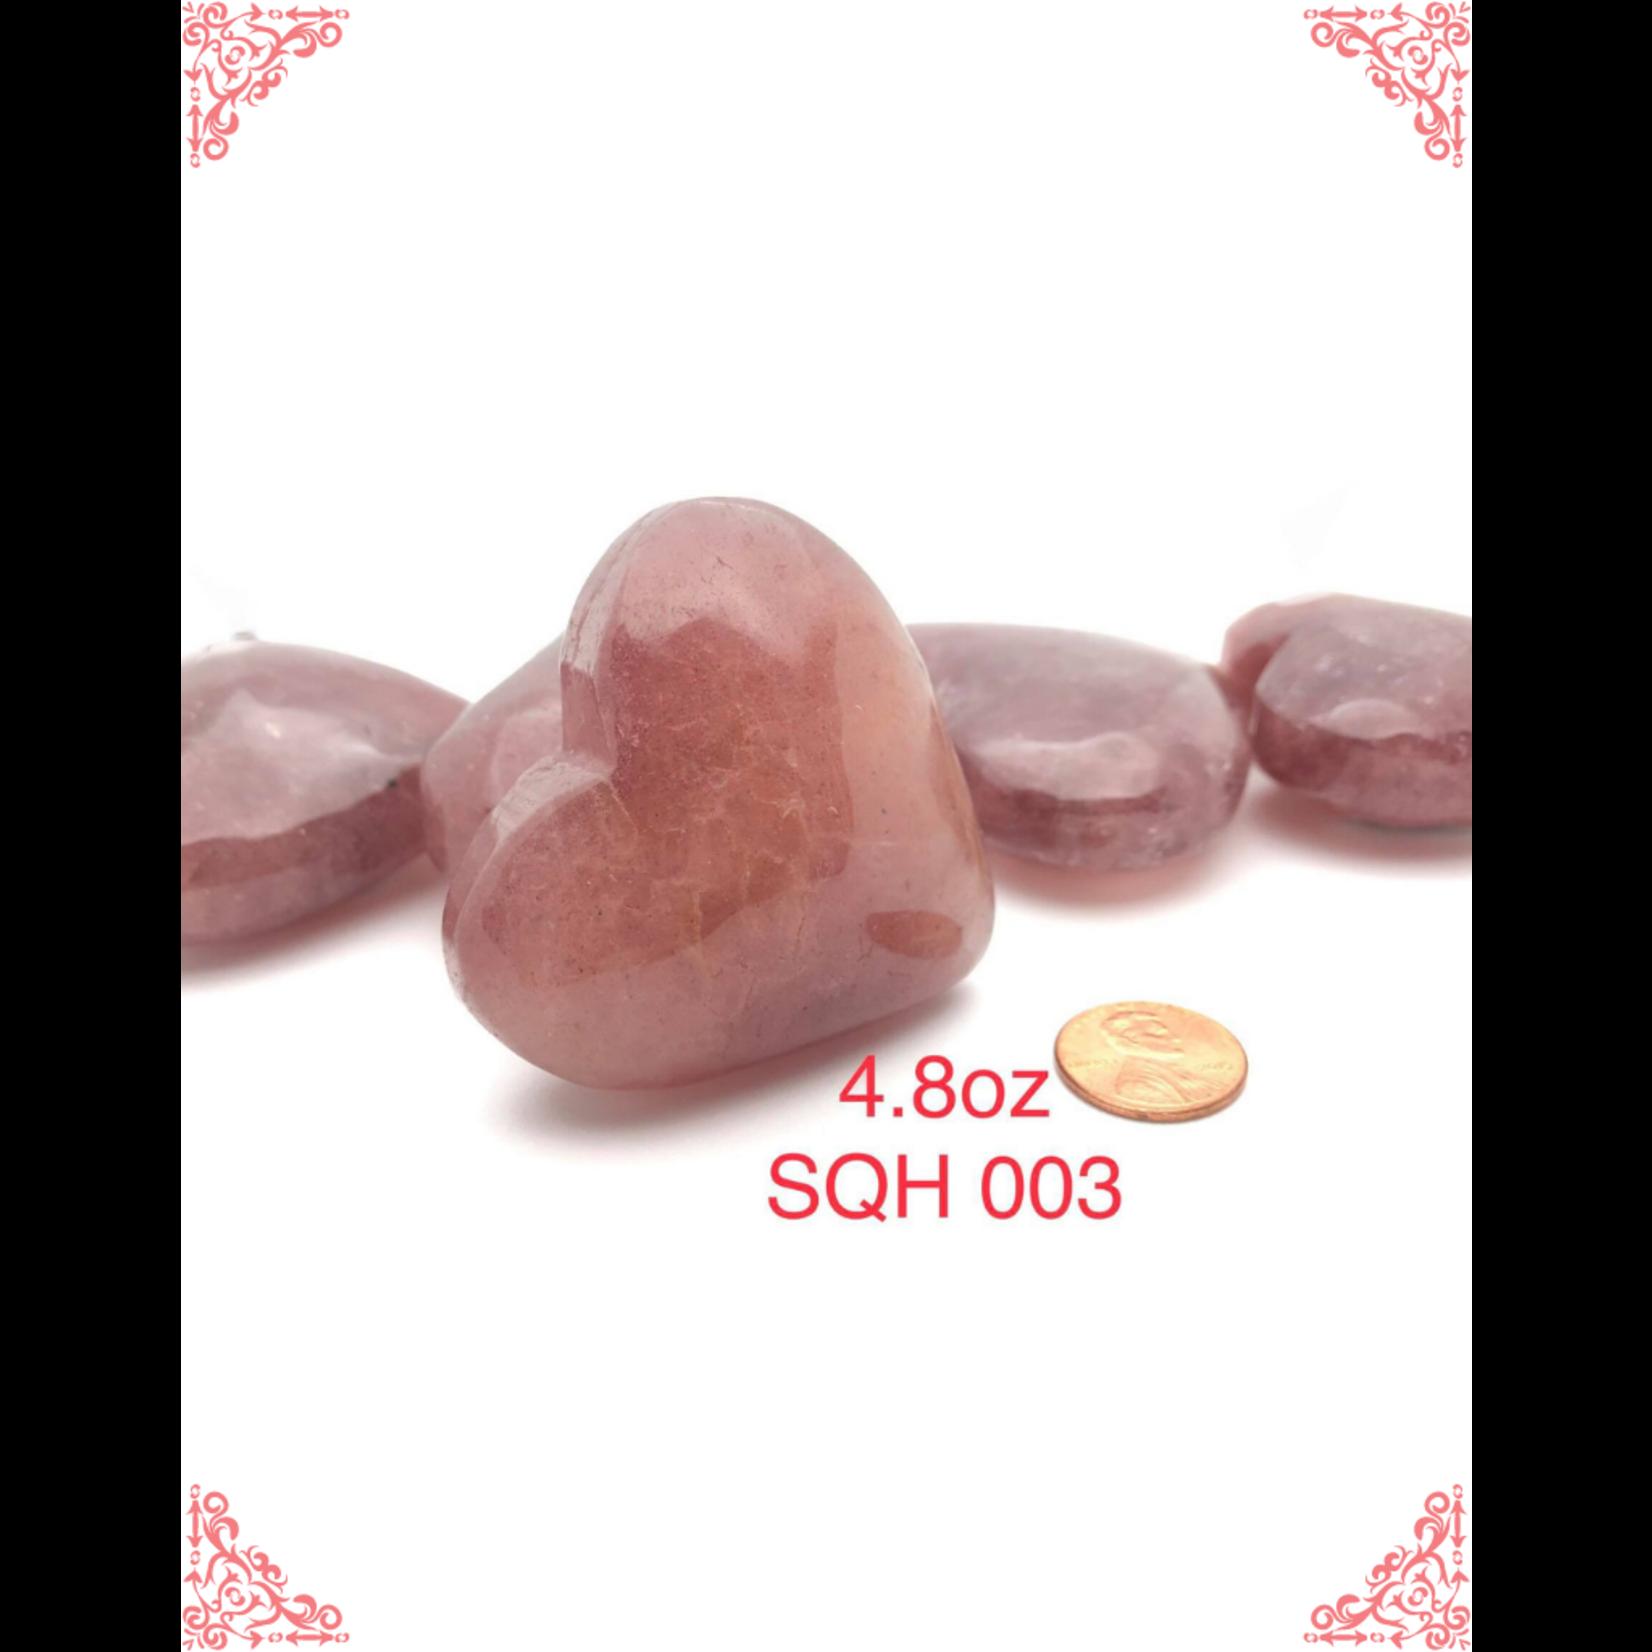 Strawberry Quartz Hearts